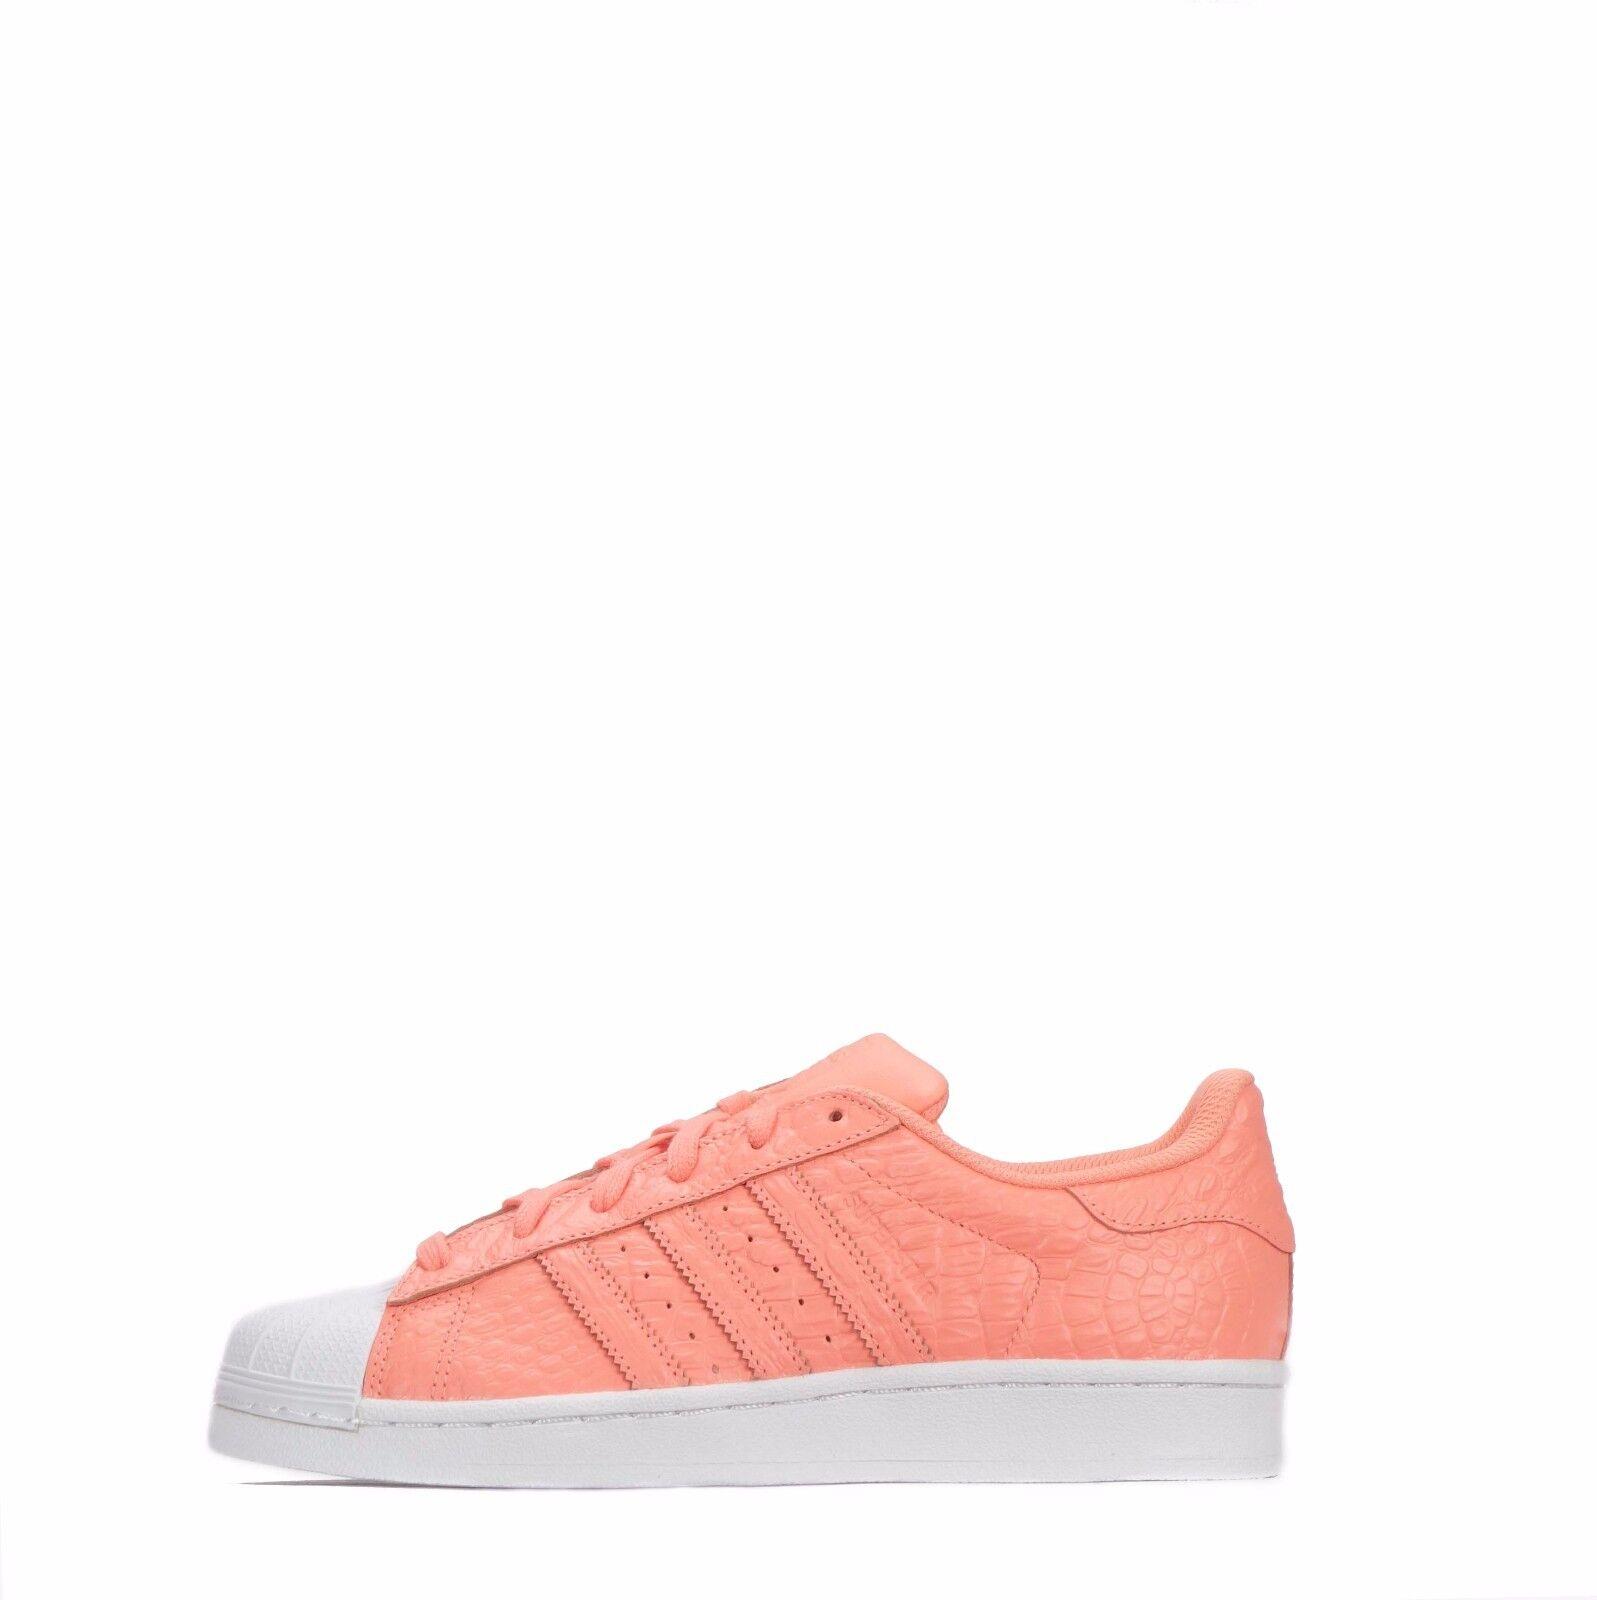 Adidas originali superstar croc scarpe da donna sole raggiante / bianco